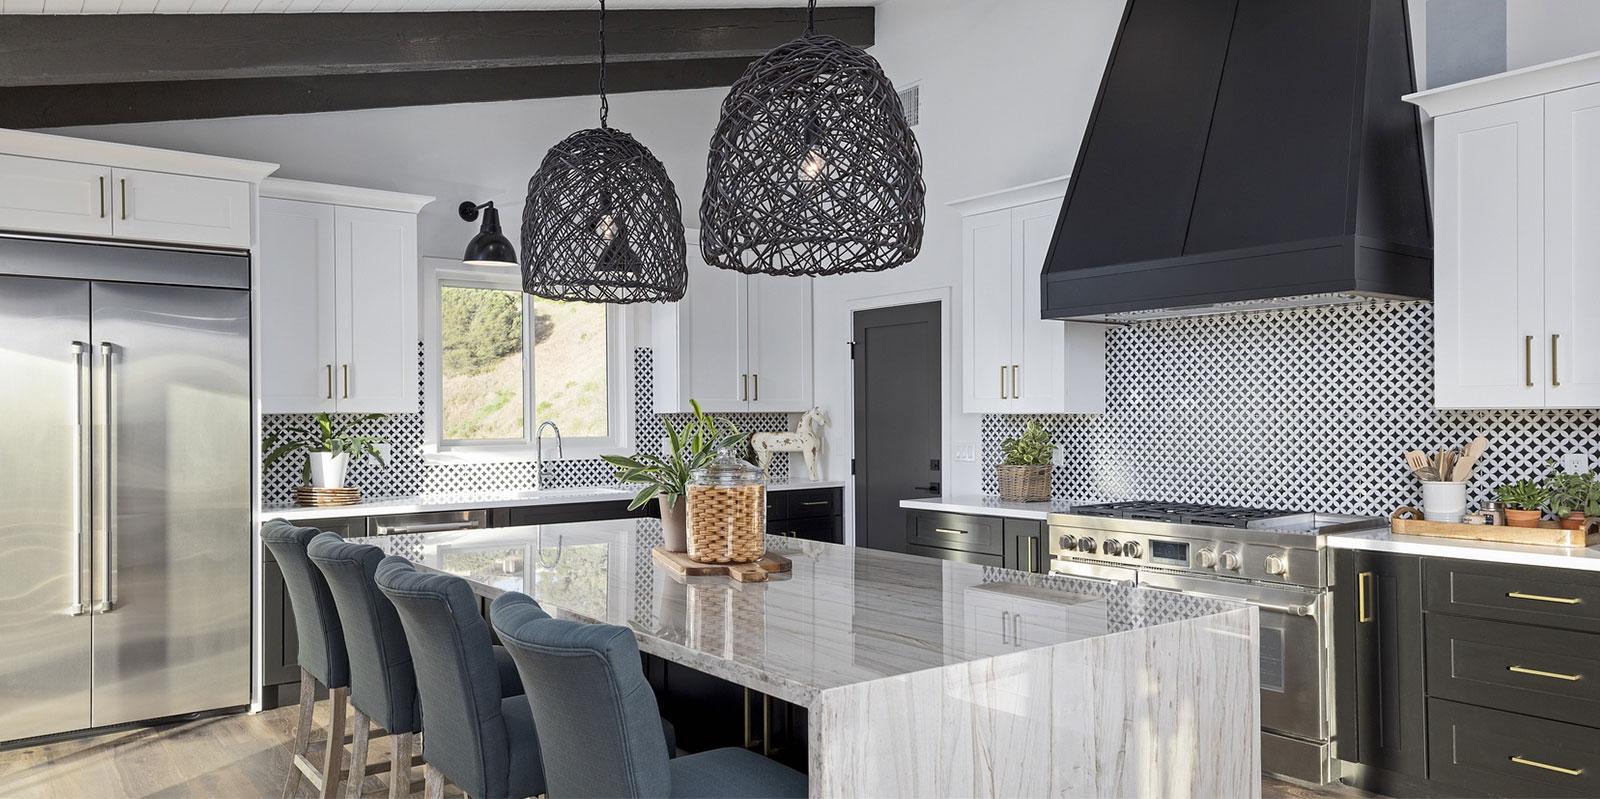 Kitchen Interior| Peggy Dearing, Realtor